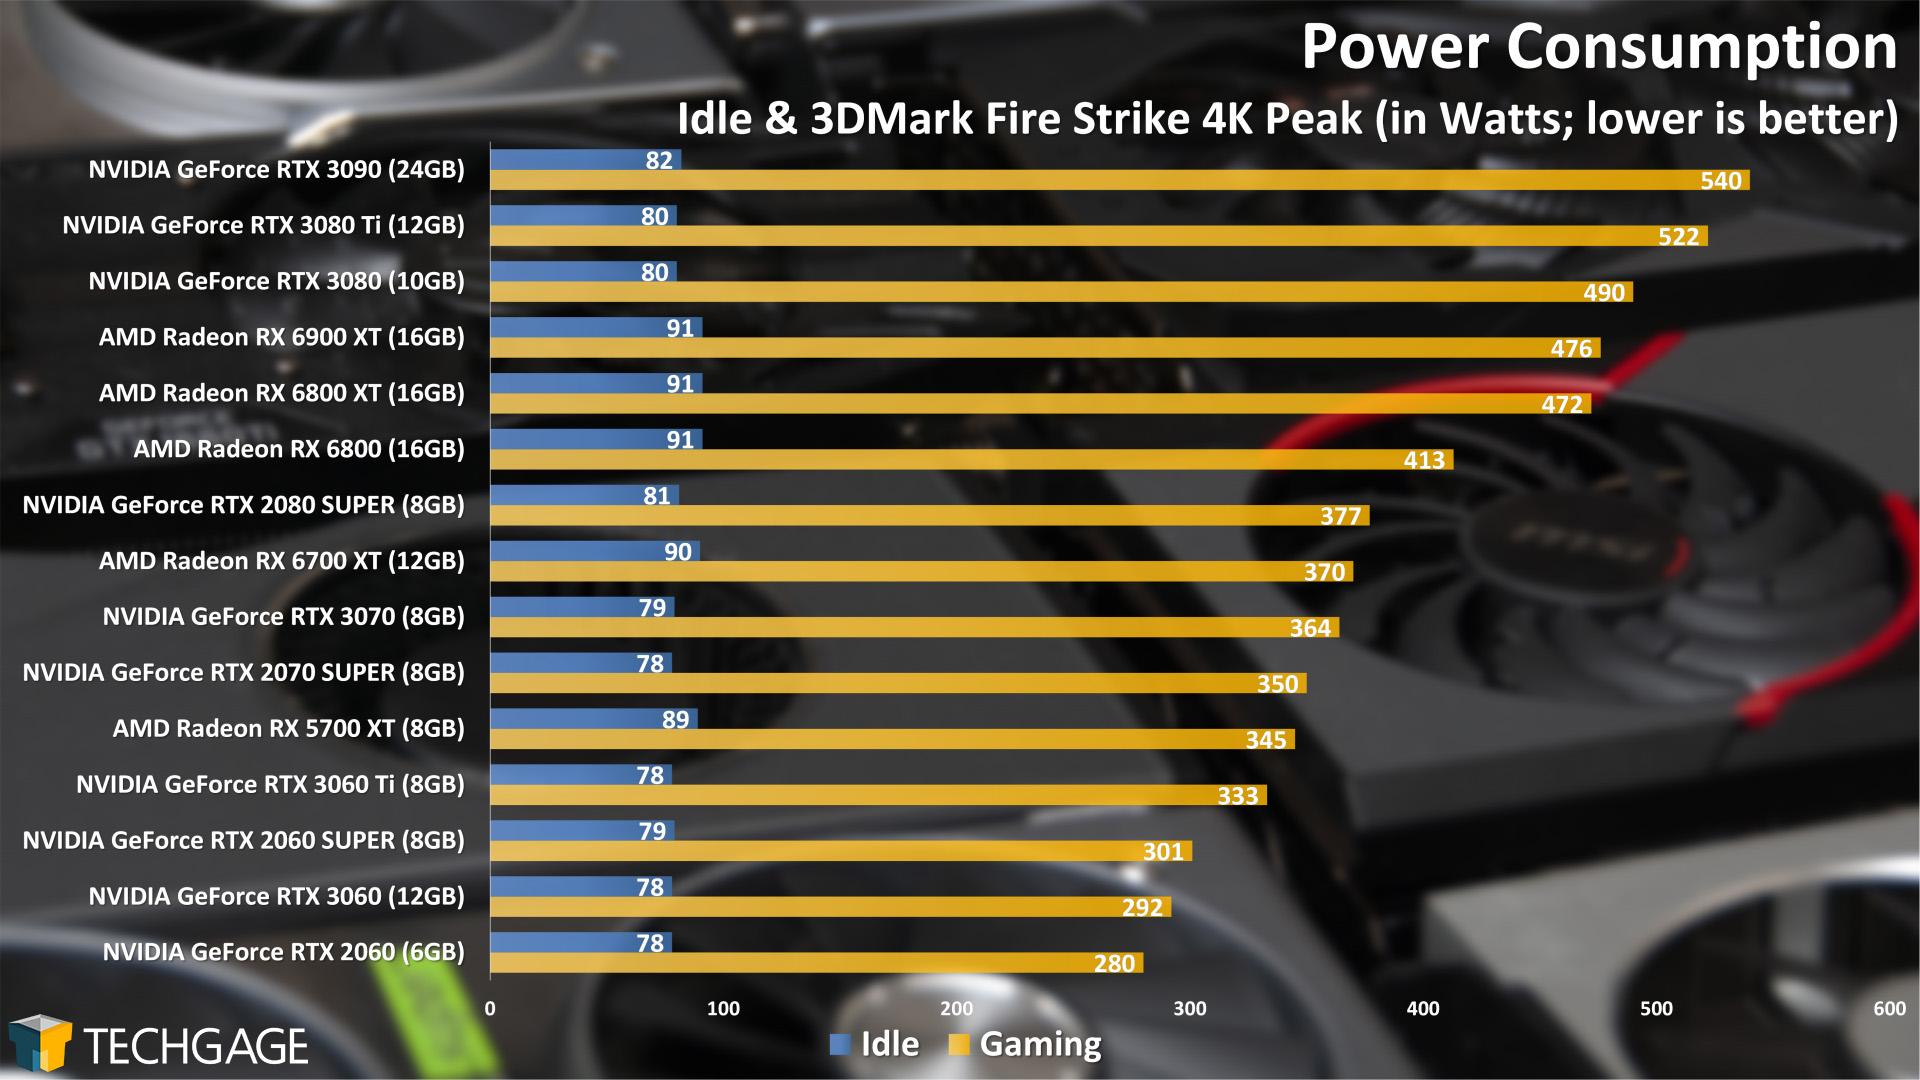 Power Consumption (NVIDIA GeForce RTX 3080 Ti)